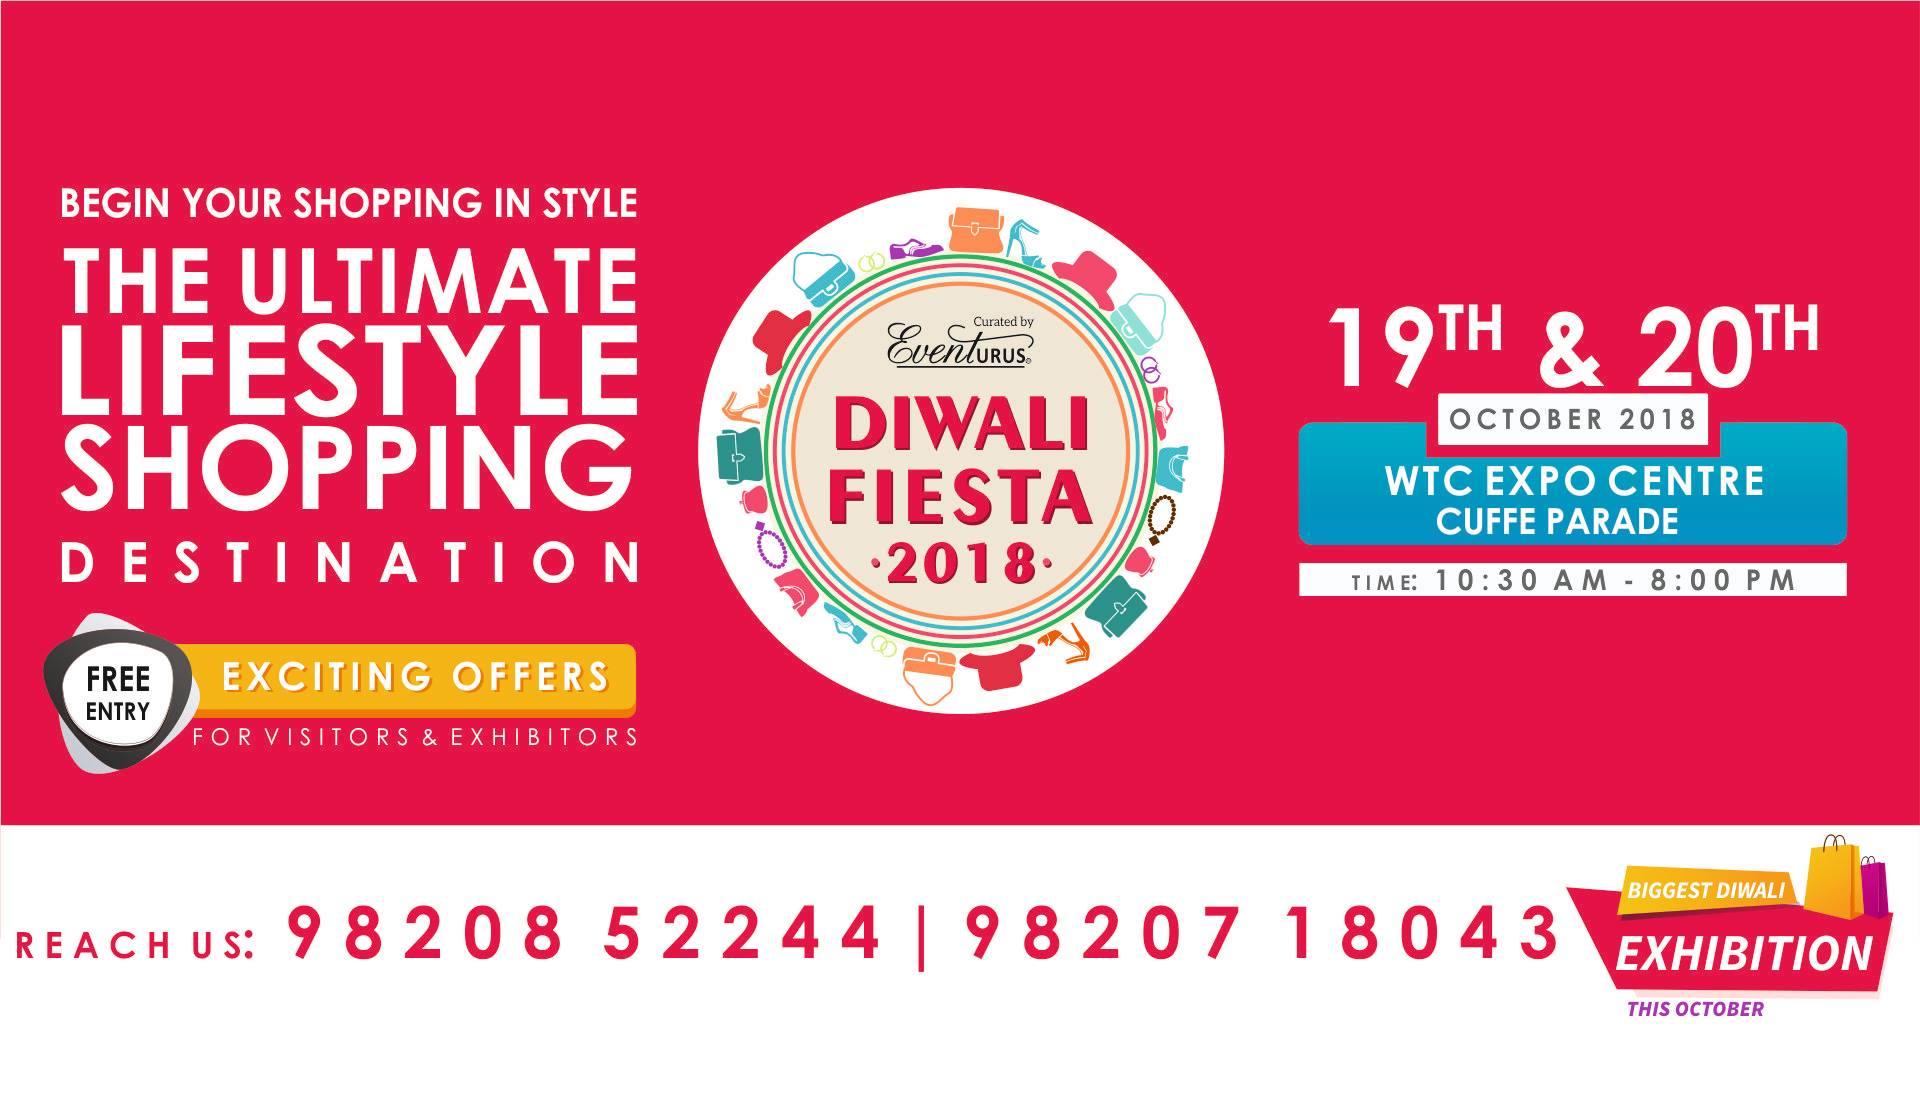 Diwali Fiesta Exhibition 2018 - WTC Cuffe Parade